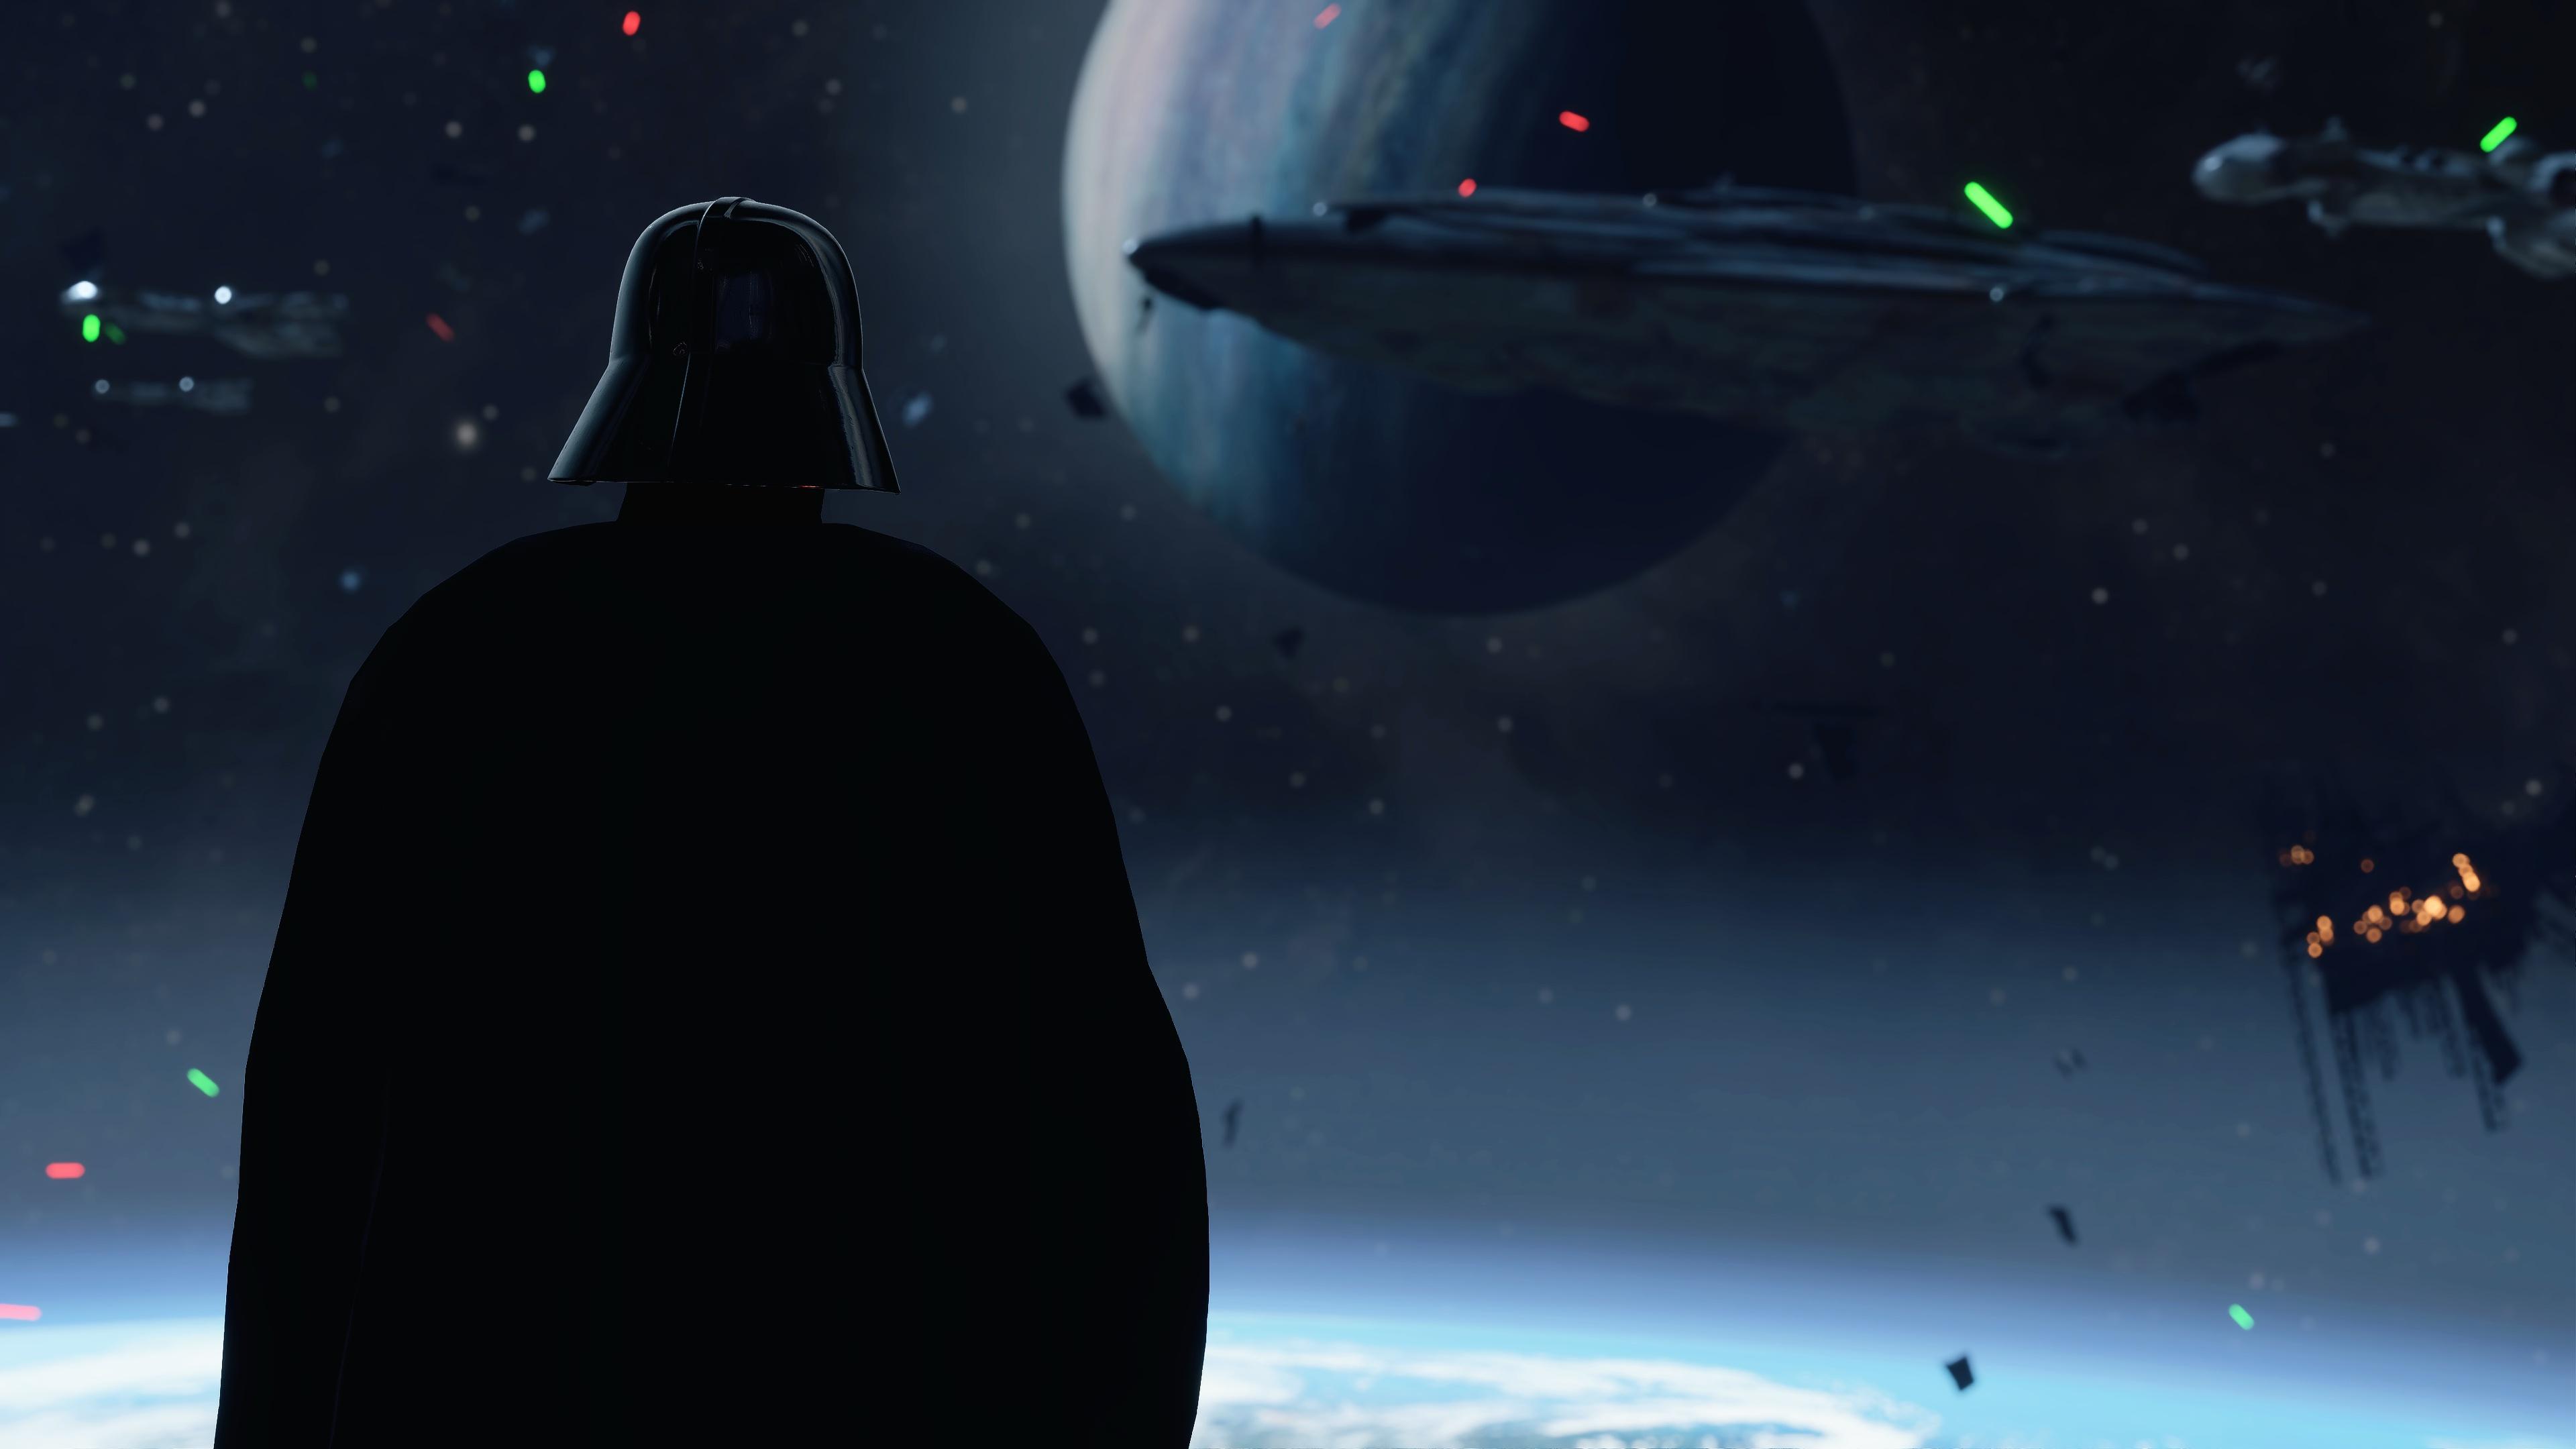 Star Wars Battlefront Ii 2017 4k Ultra Hd Wallpaper Background Image 3840x2160 Id 1005456 Wallpaper Abyss